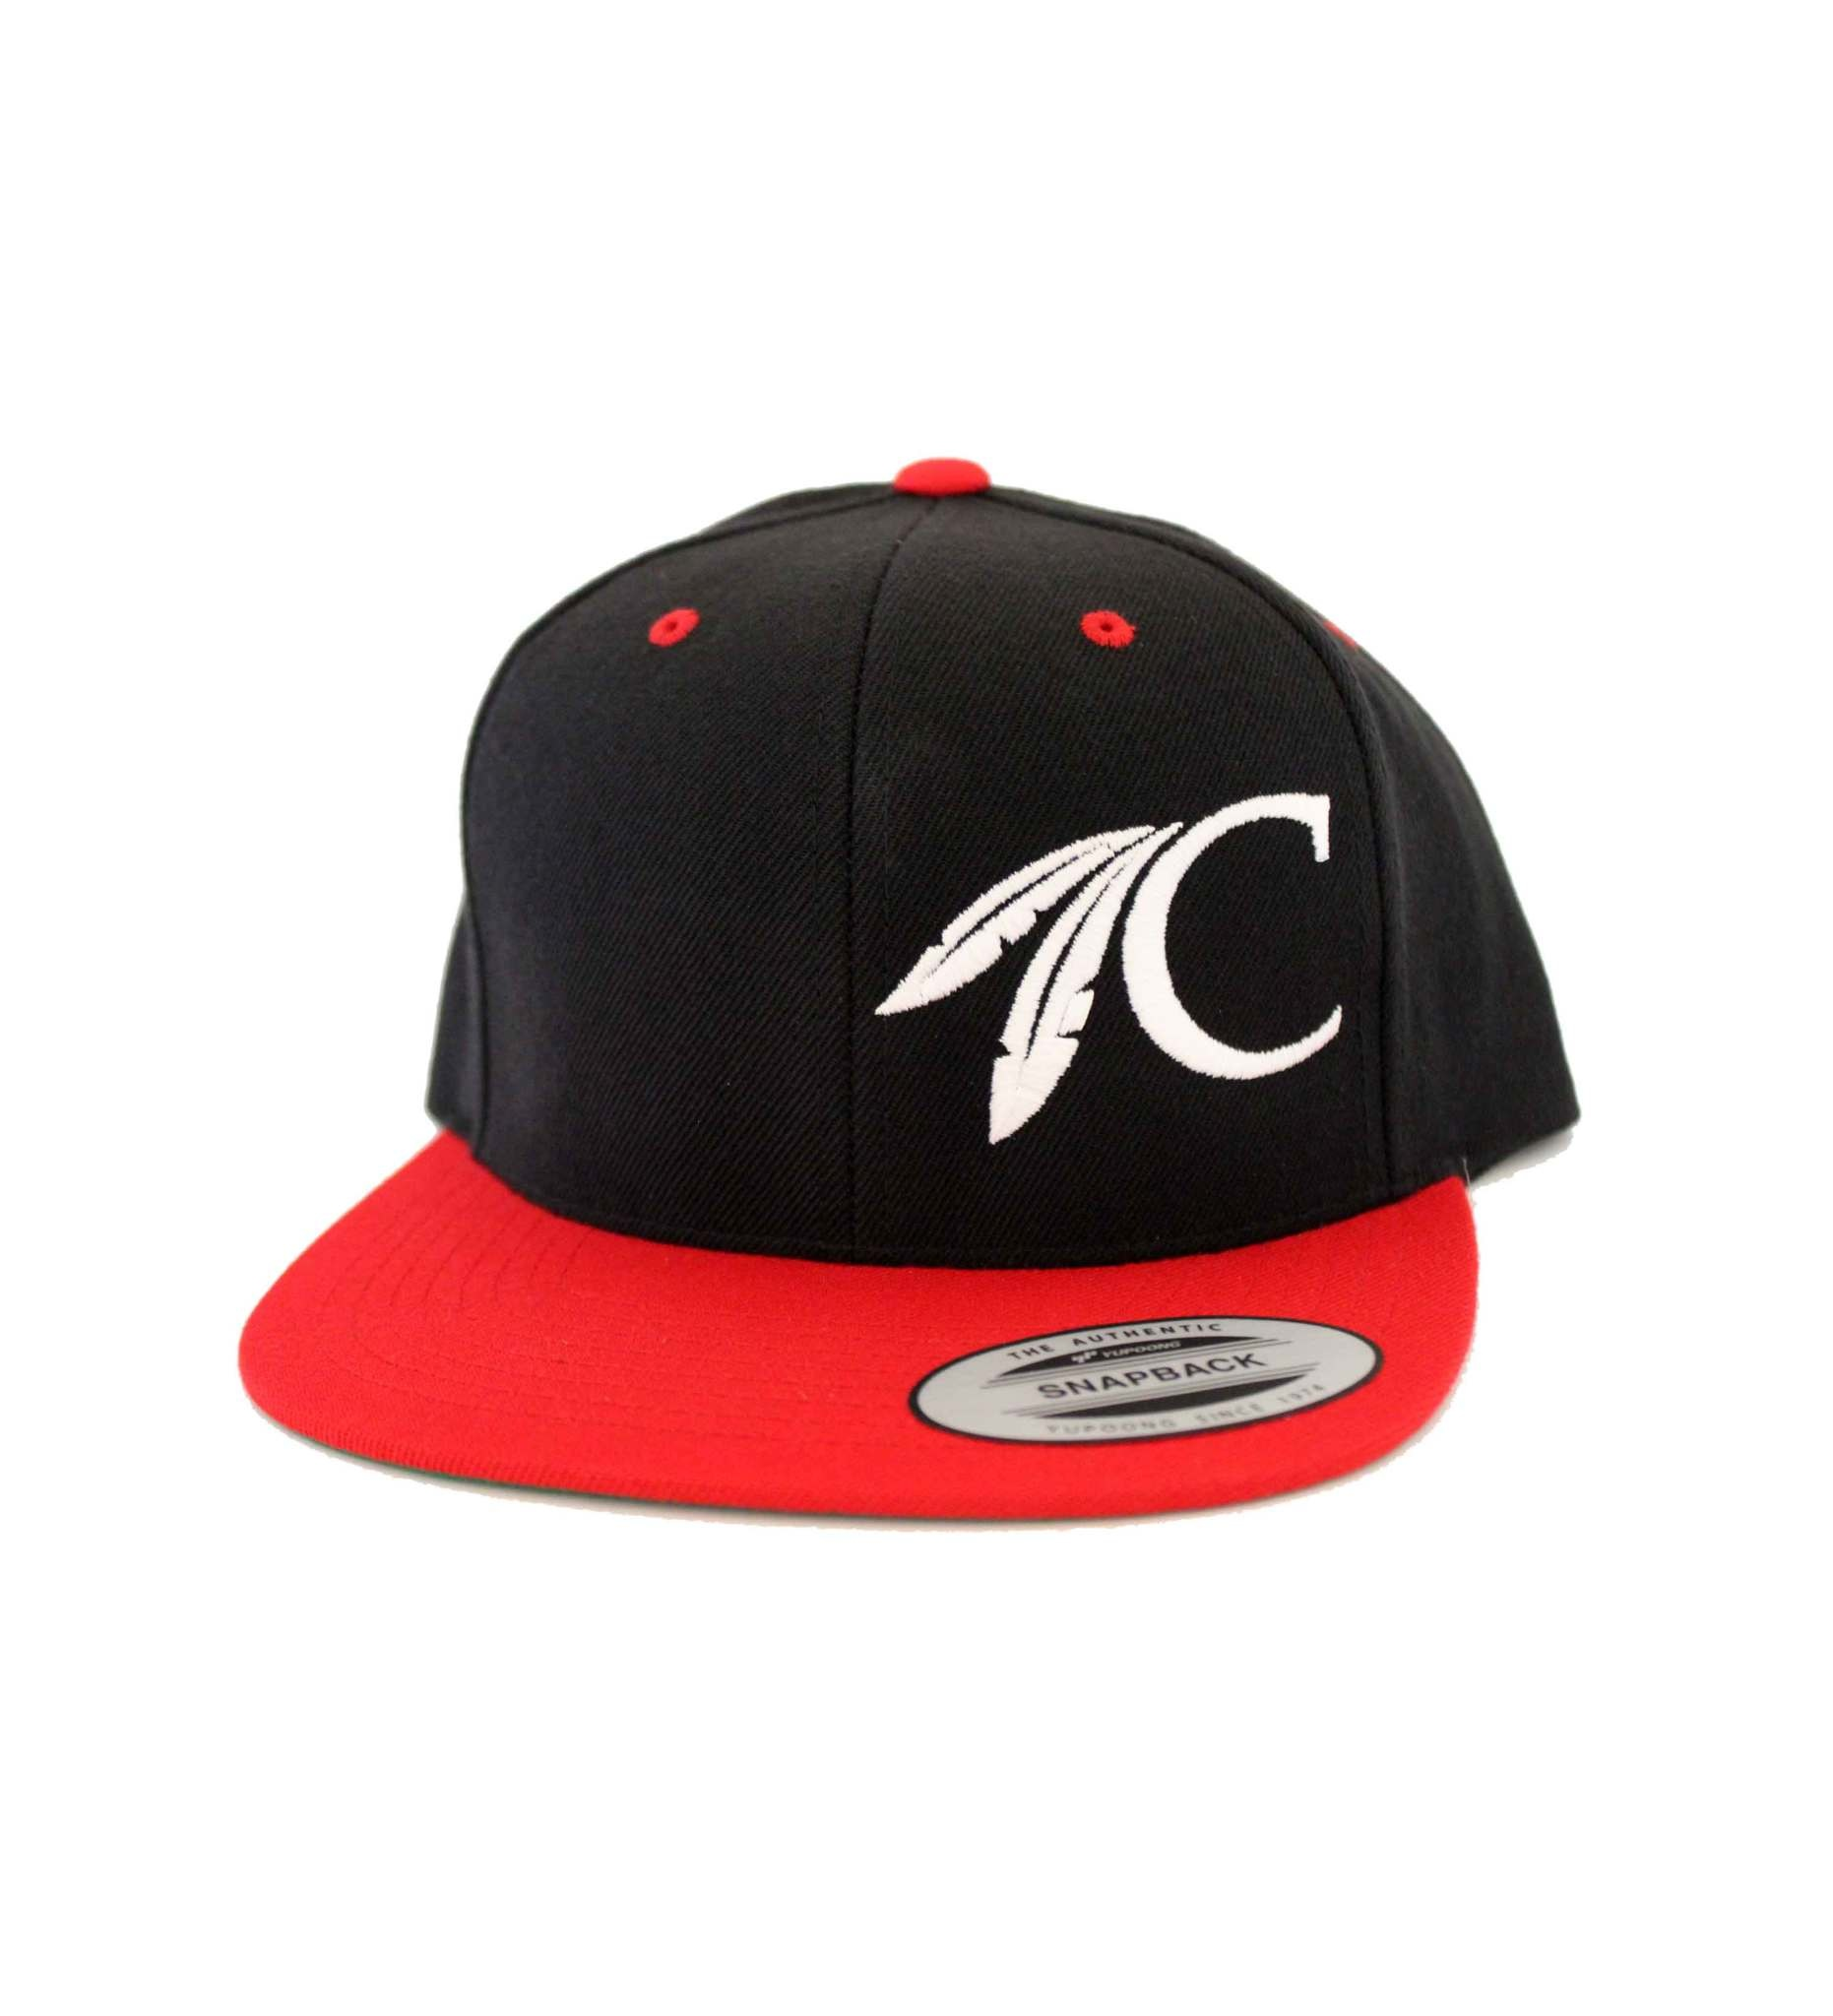 FLAT BILL Black & Red C FEATHER Cap